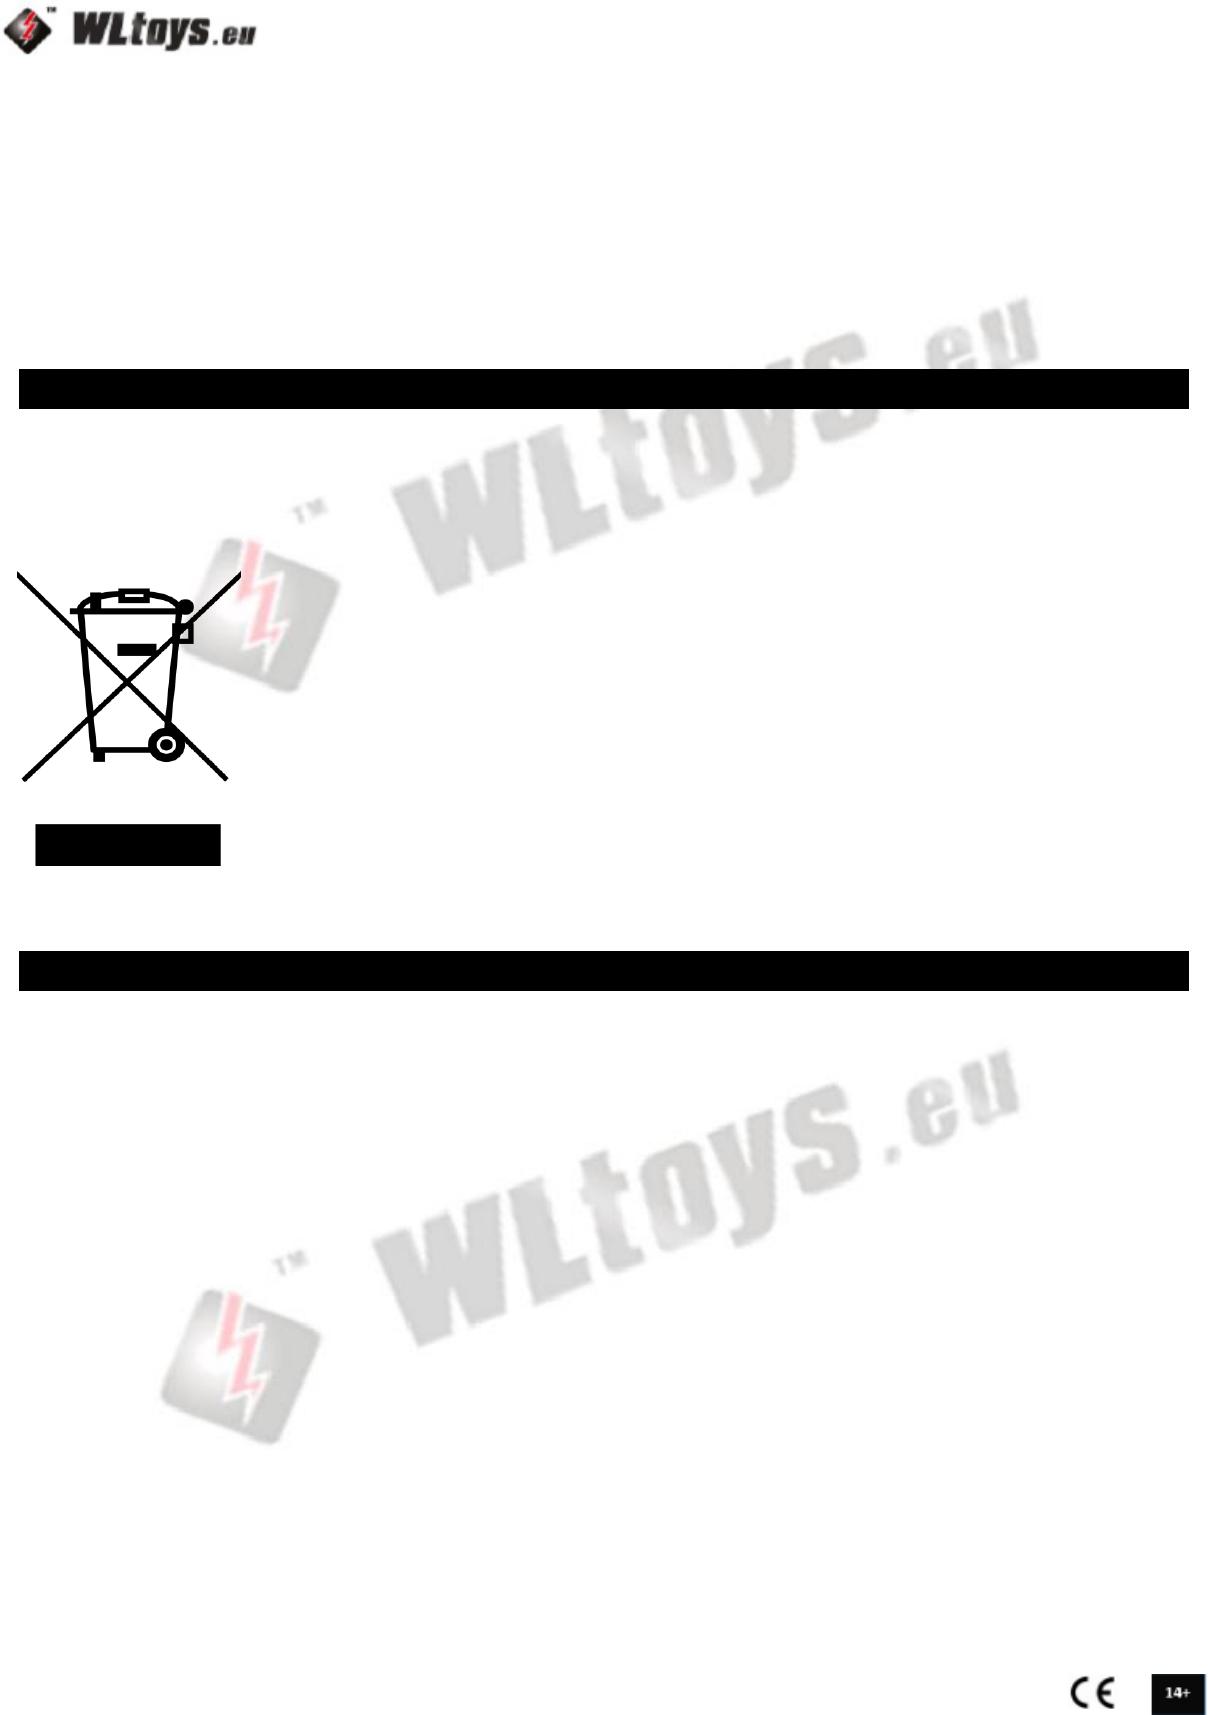 Handleiding Wltoys V323 Skywalker Hexacopter Pagina 2 Van 9 English Wiring Diagram